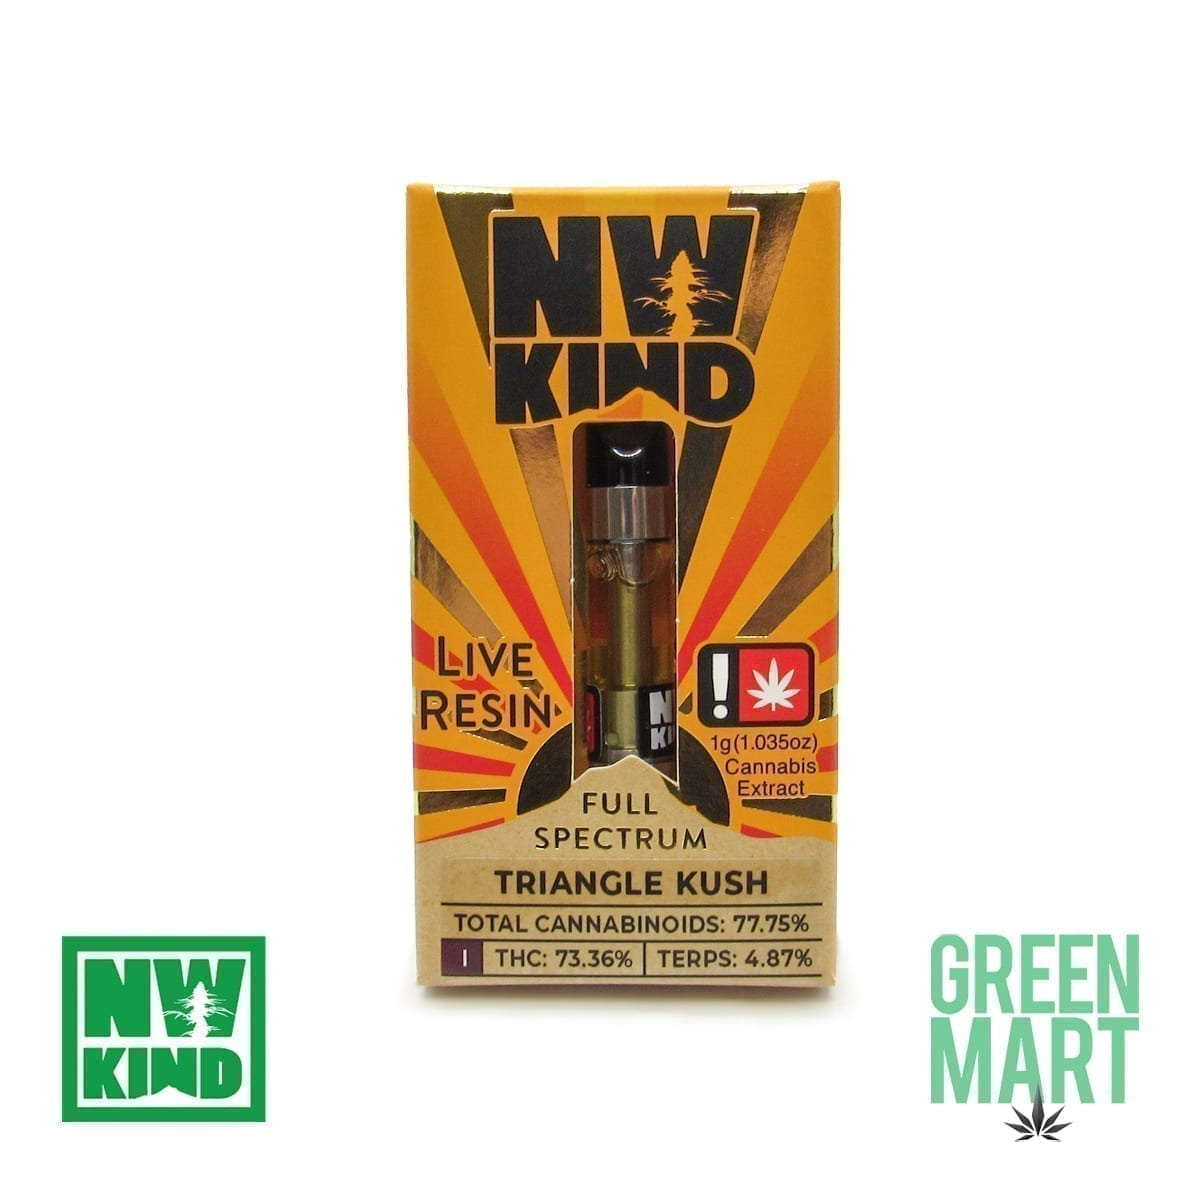 NW Kind Distillate Cartridge - Triangle Kush